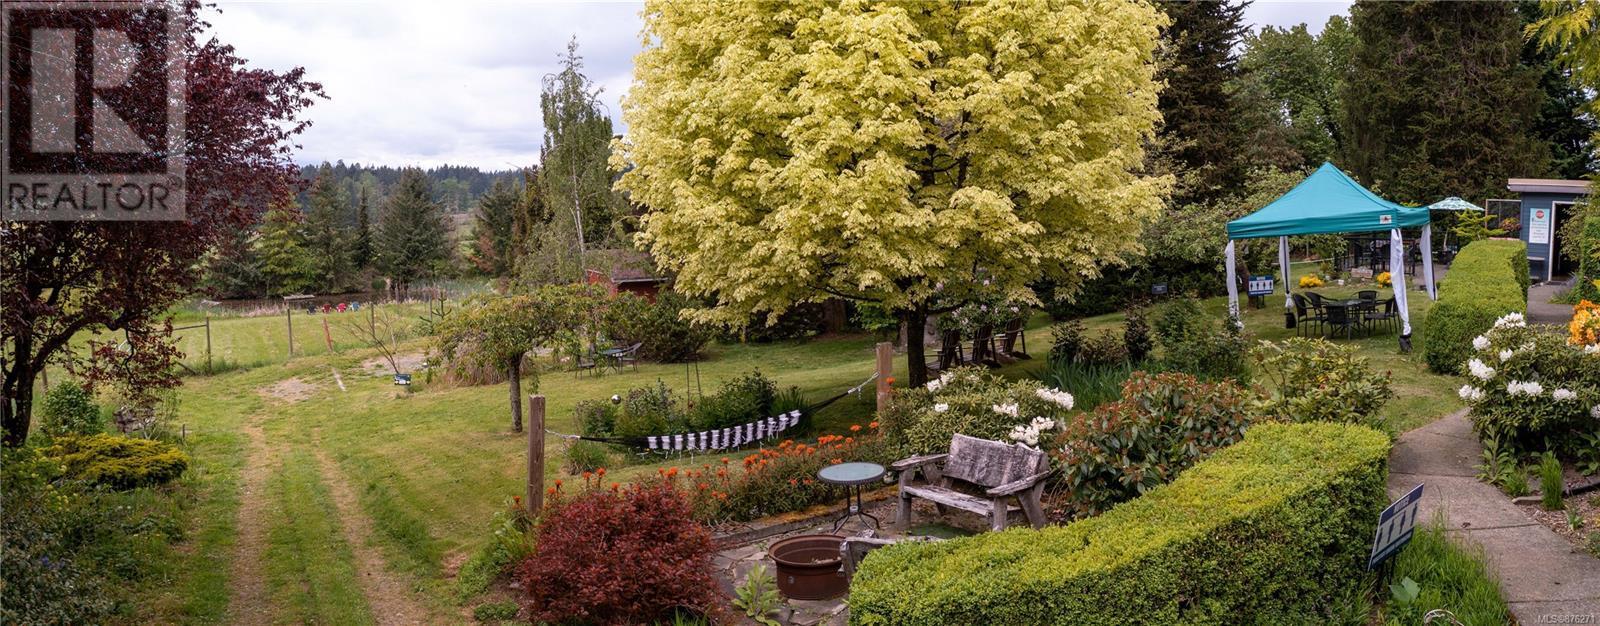 1854 Myhrest RdCobble Hill, British Columbia  V0R 1N1 - Photo 94 - 876271